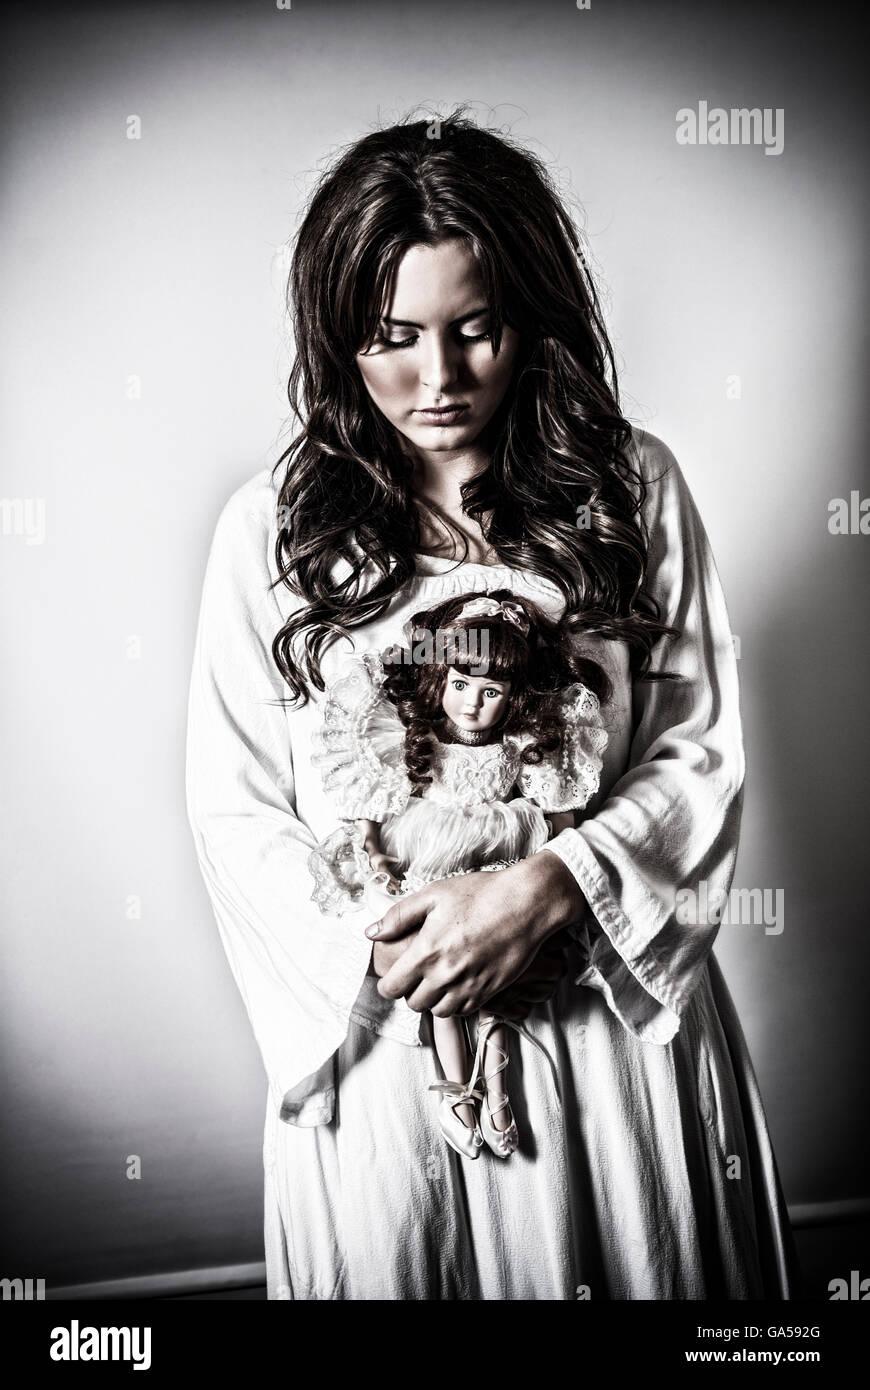 Sad Woman Holding A Vintage Doll